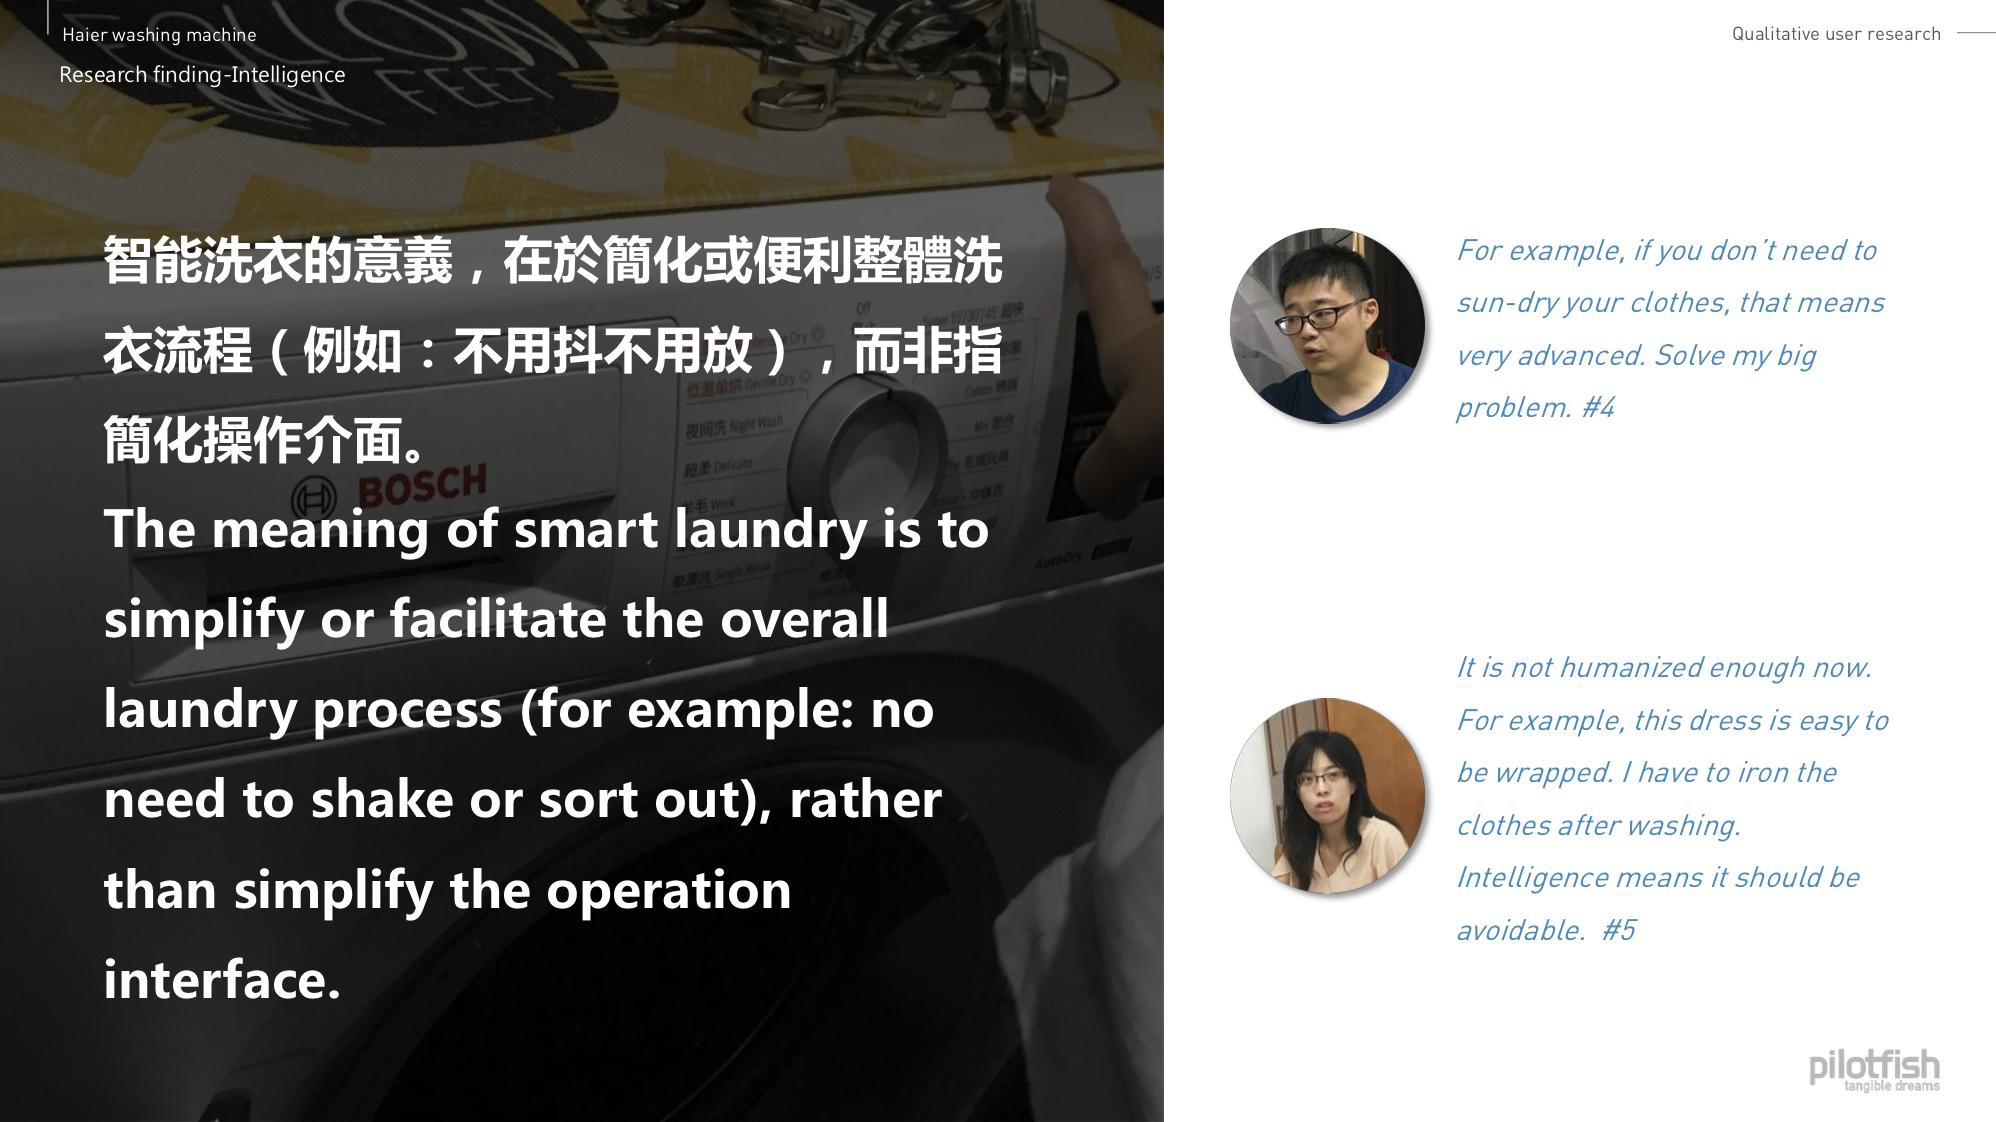 20170727_Haier_washing machine innovative UI_P0 presentation_V4_Eng_18.jpg